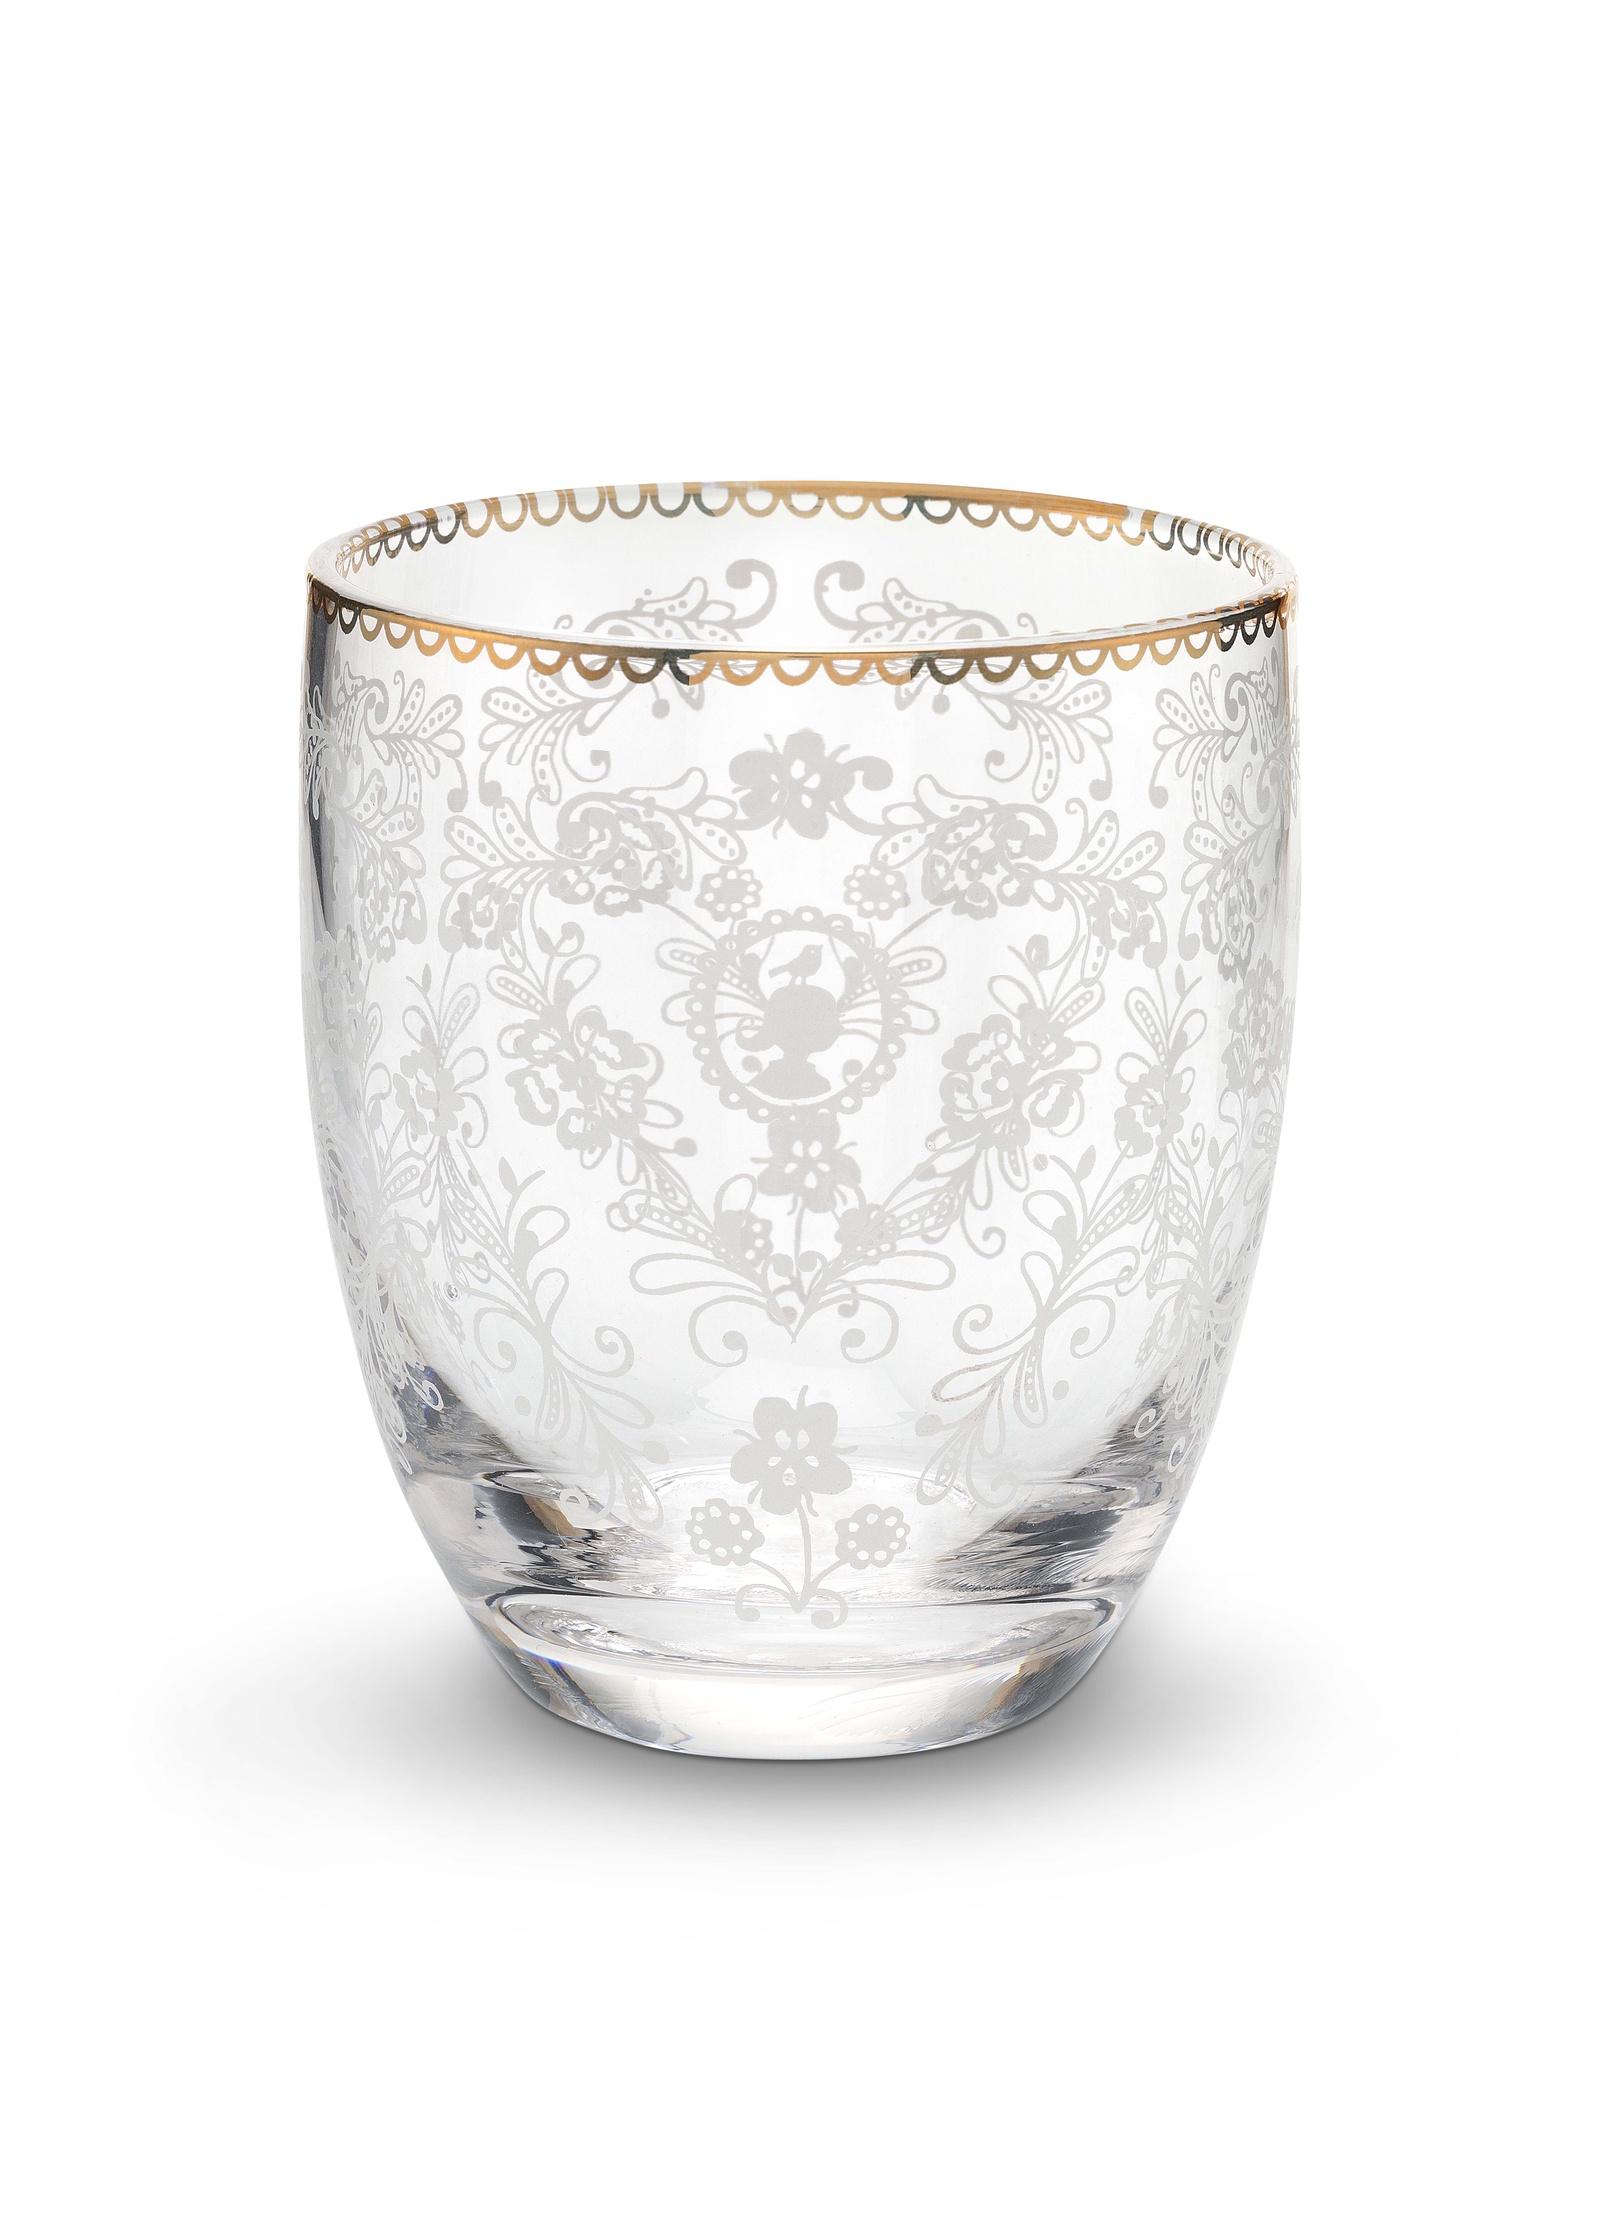 Набор стаканов Pip studio Floral Water Glass, 6 шт zhiyusun 68015e 020 touch screen sensor glass 164 127 6 5 inch industrial use 8line 164mm 127mm